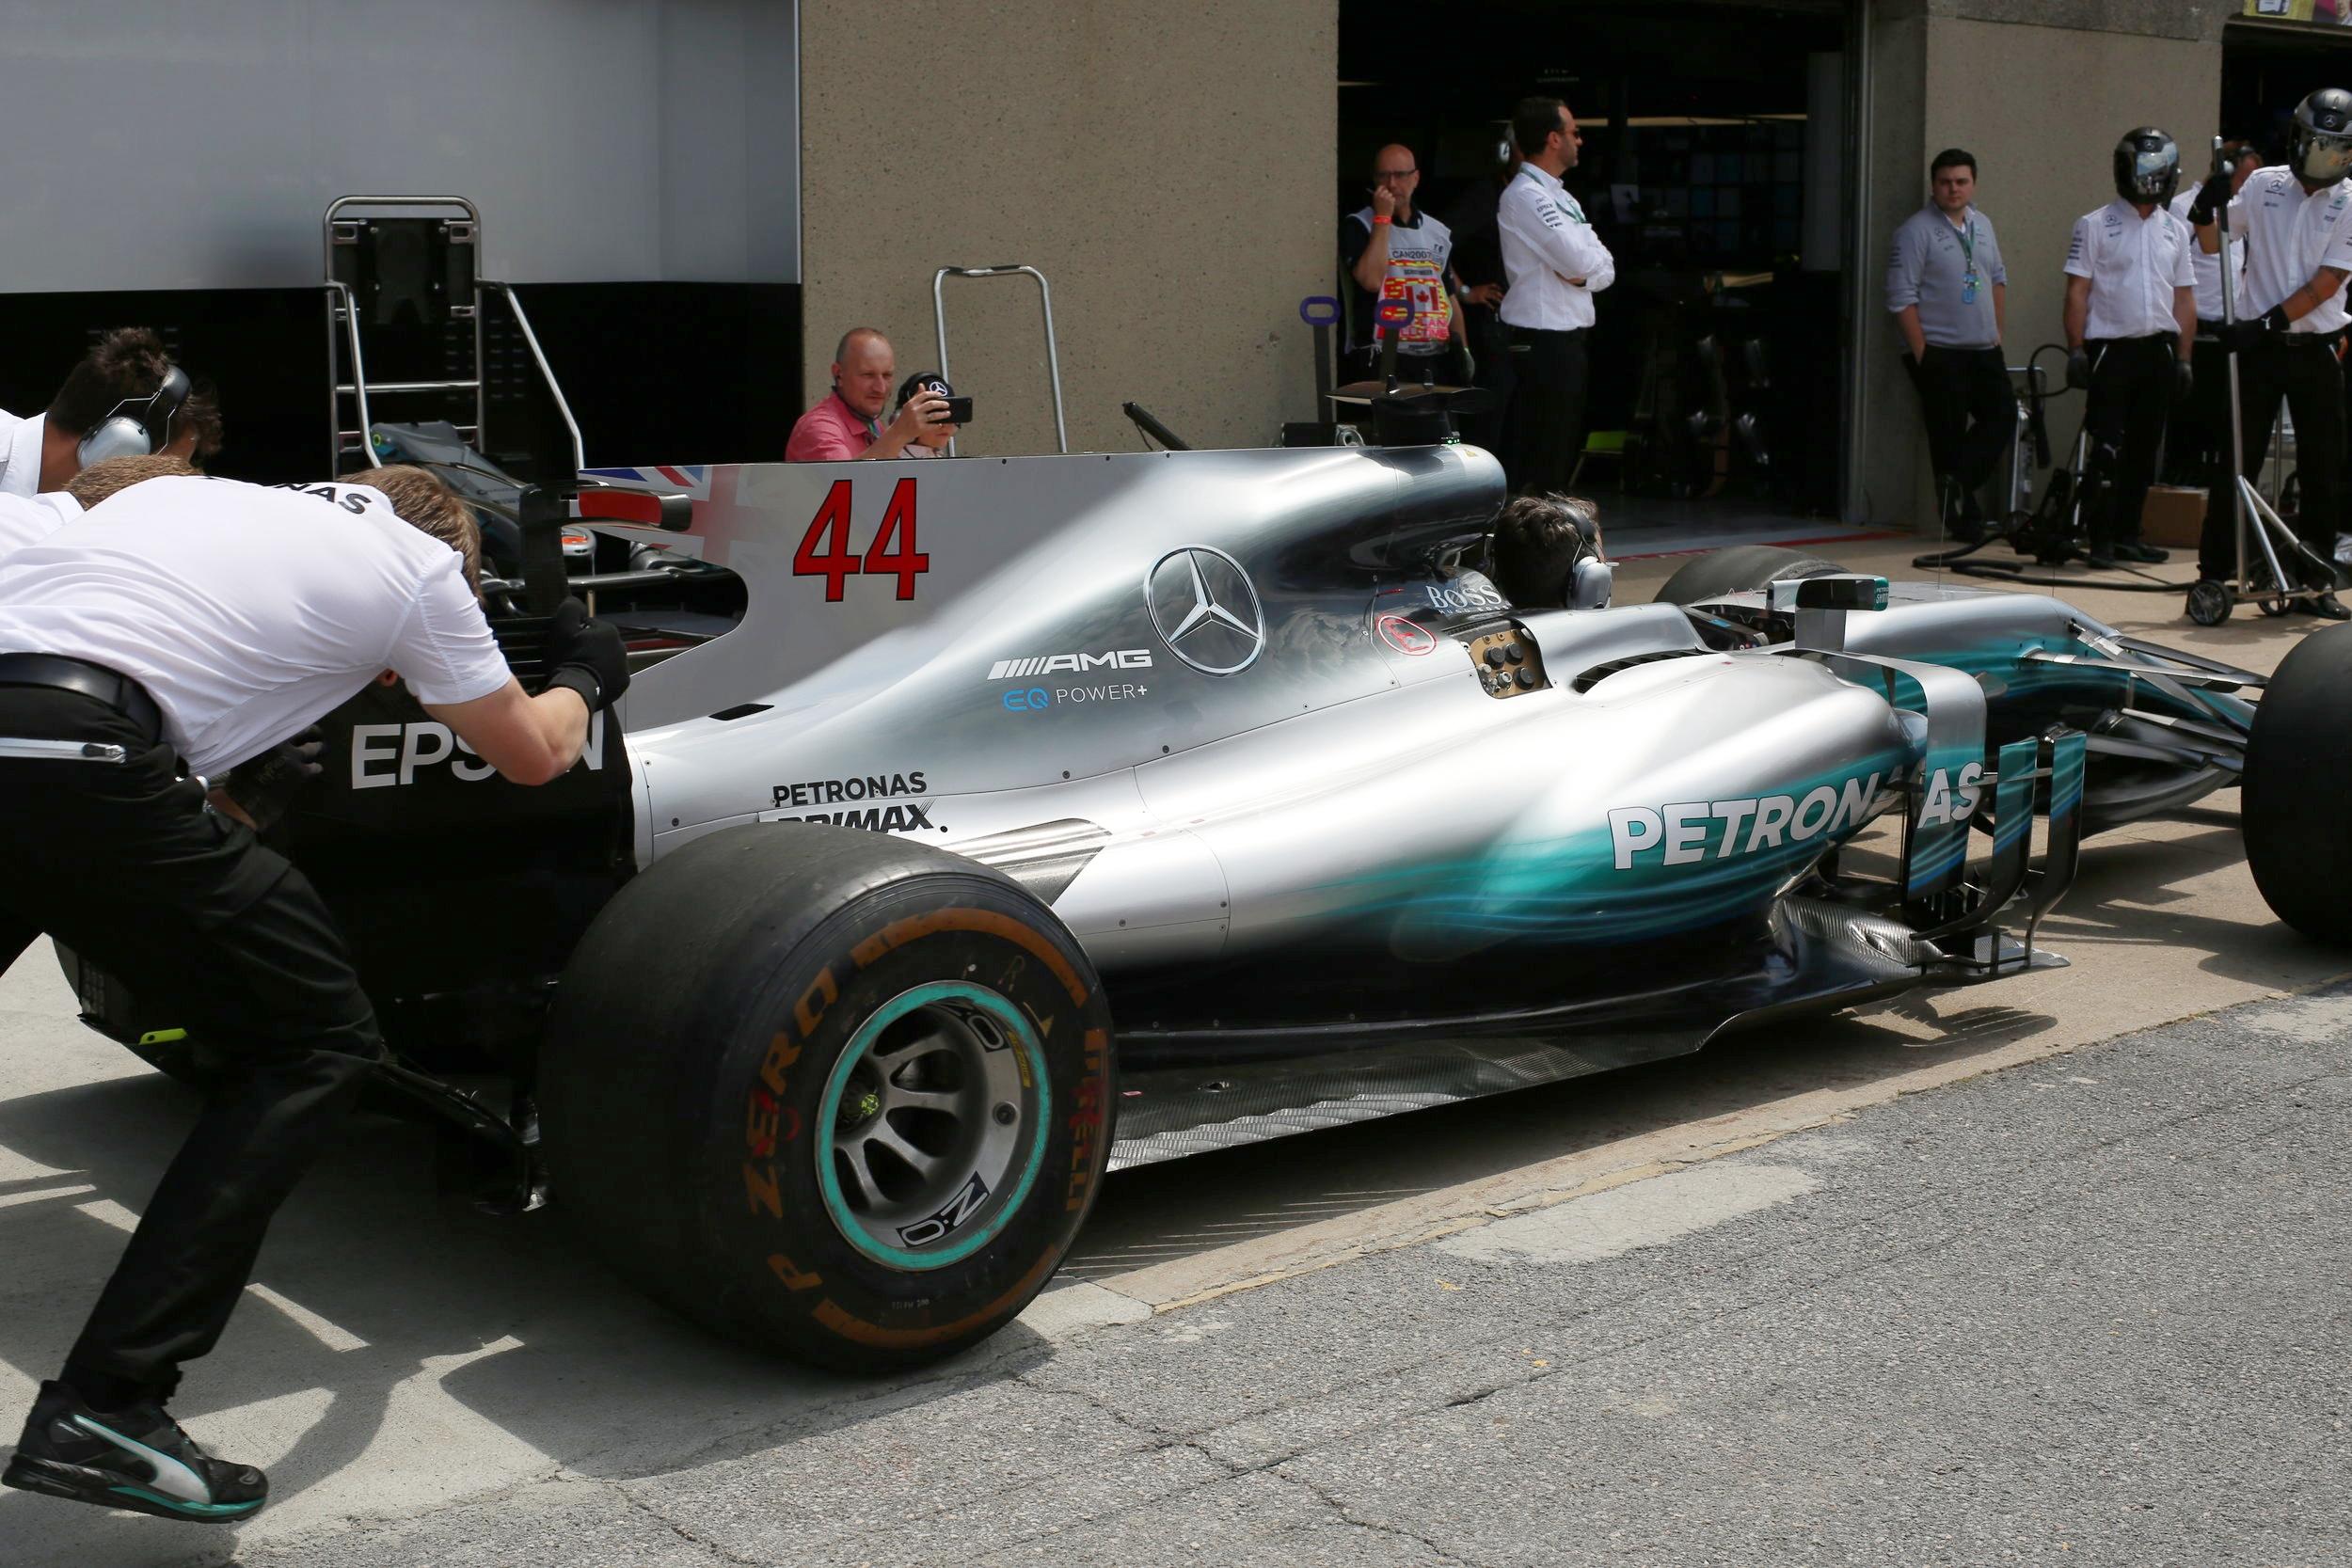 Lewis Hamilton 駕駛的 Mercedes 「銀箭」